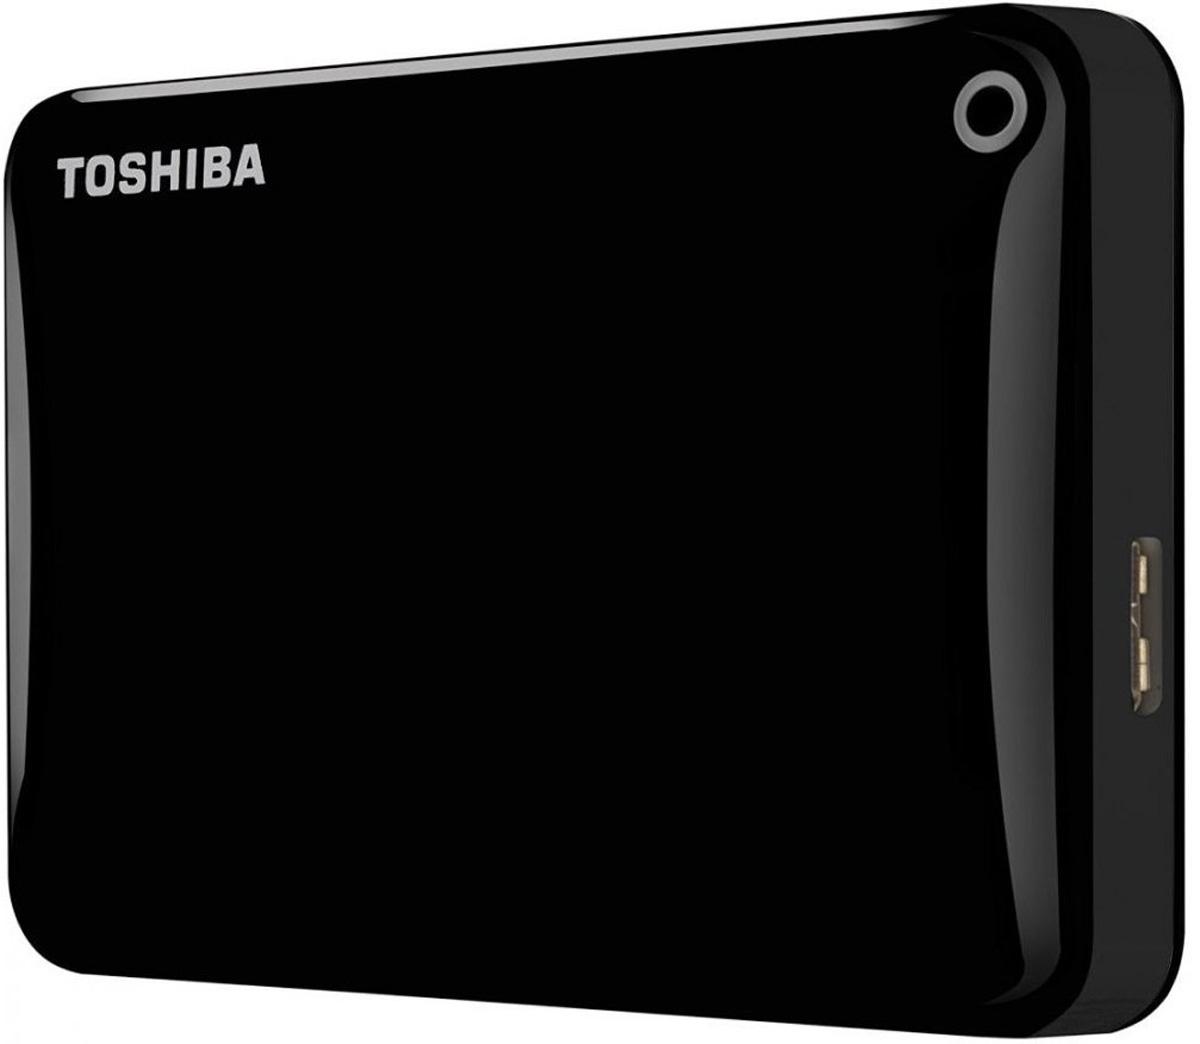 Toshiba Canvio Connect II 3TB, Black внешний жесткий диск (HDTC830EK3CA) - Носители информации